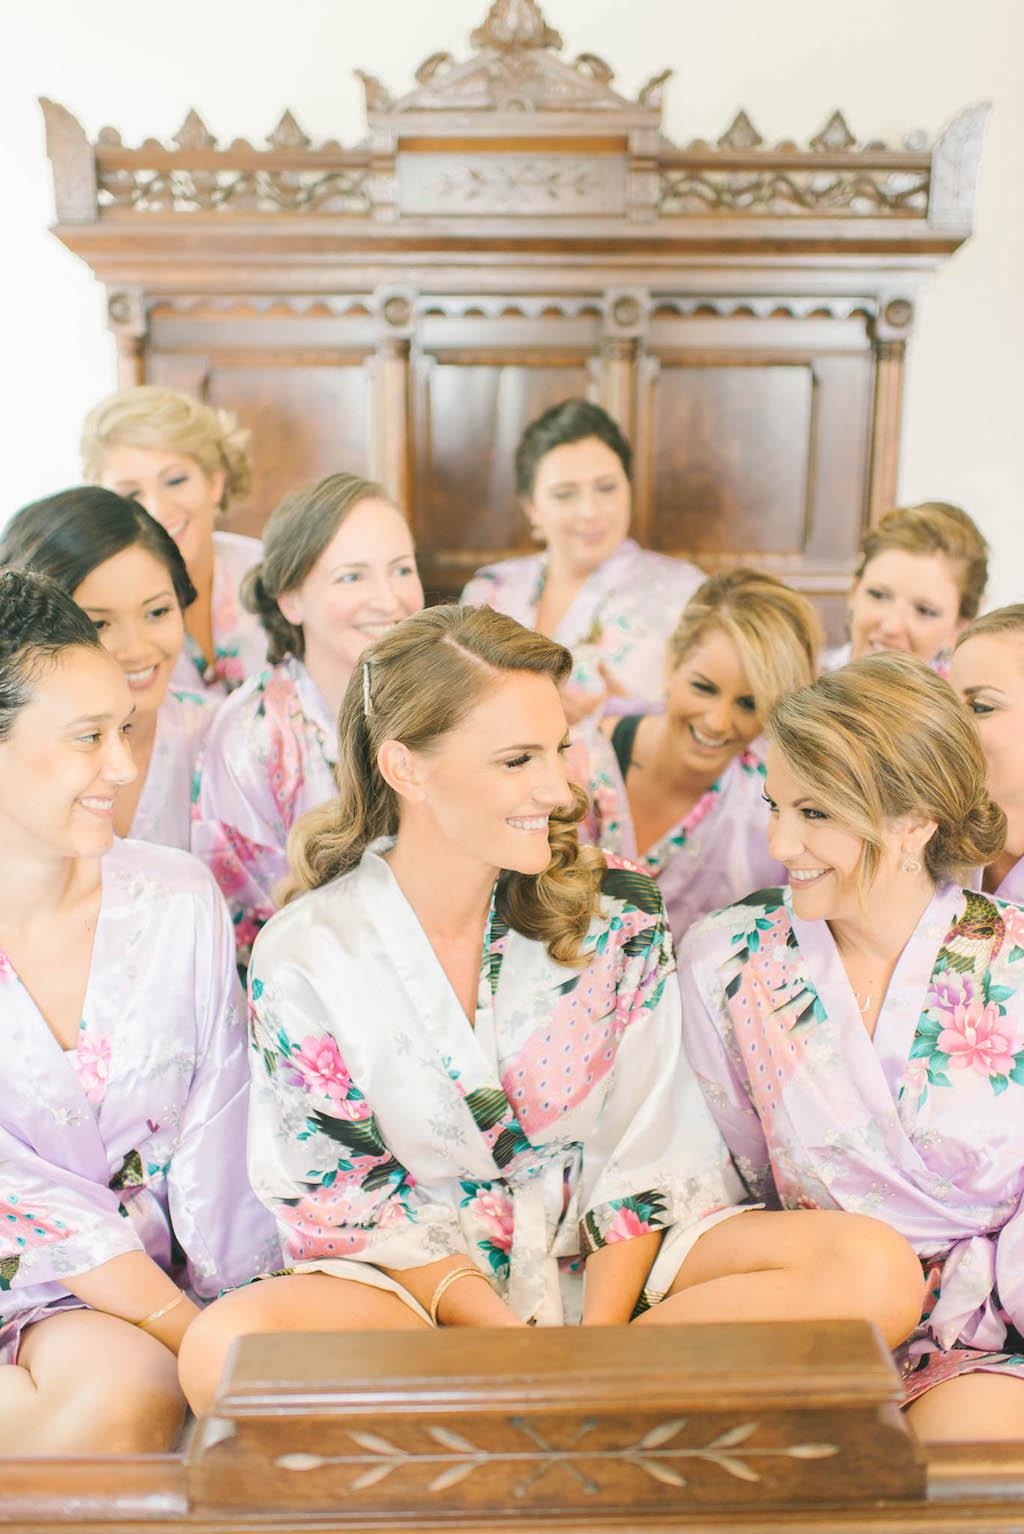 1-25-16-dreamy-pastel-maryland-vineyard-wedding-lizfogarty-1